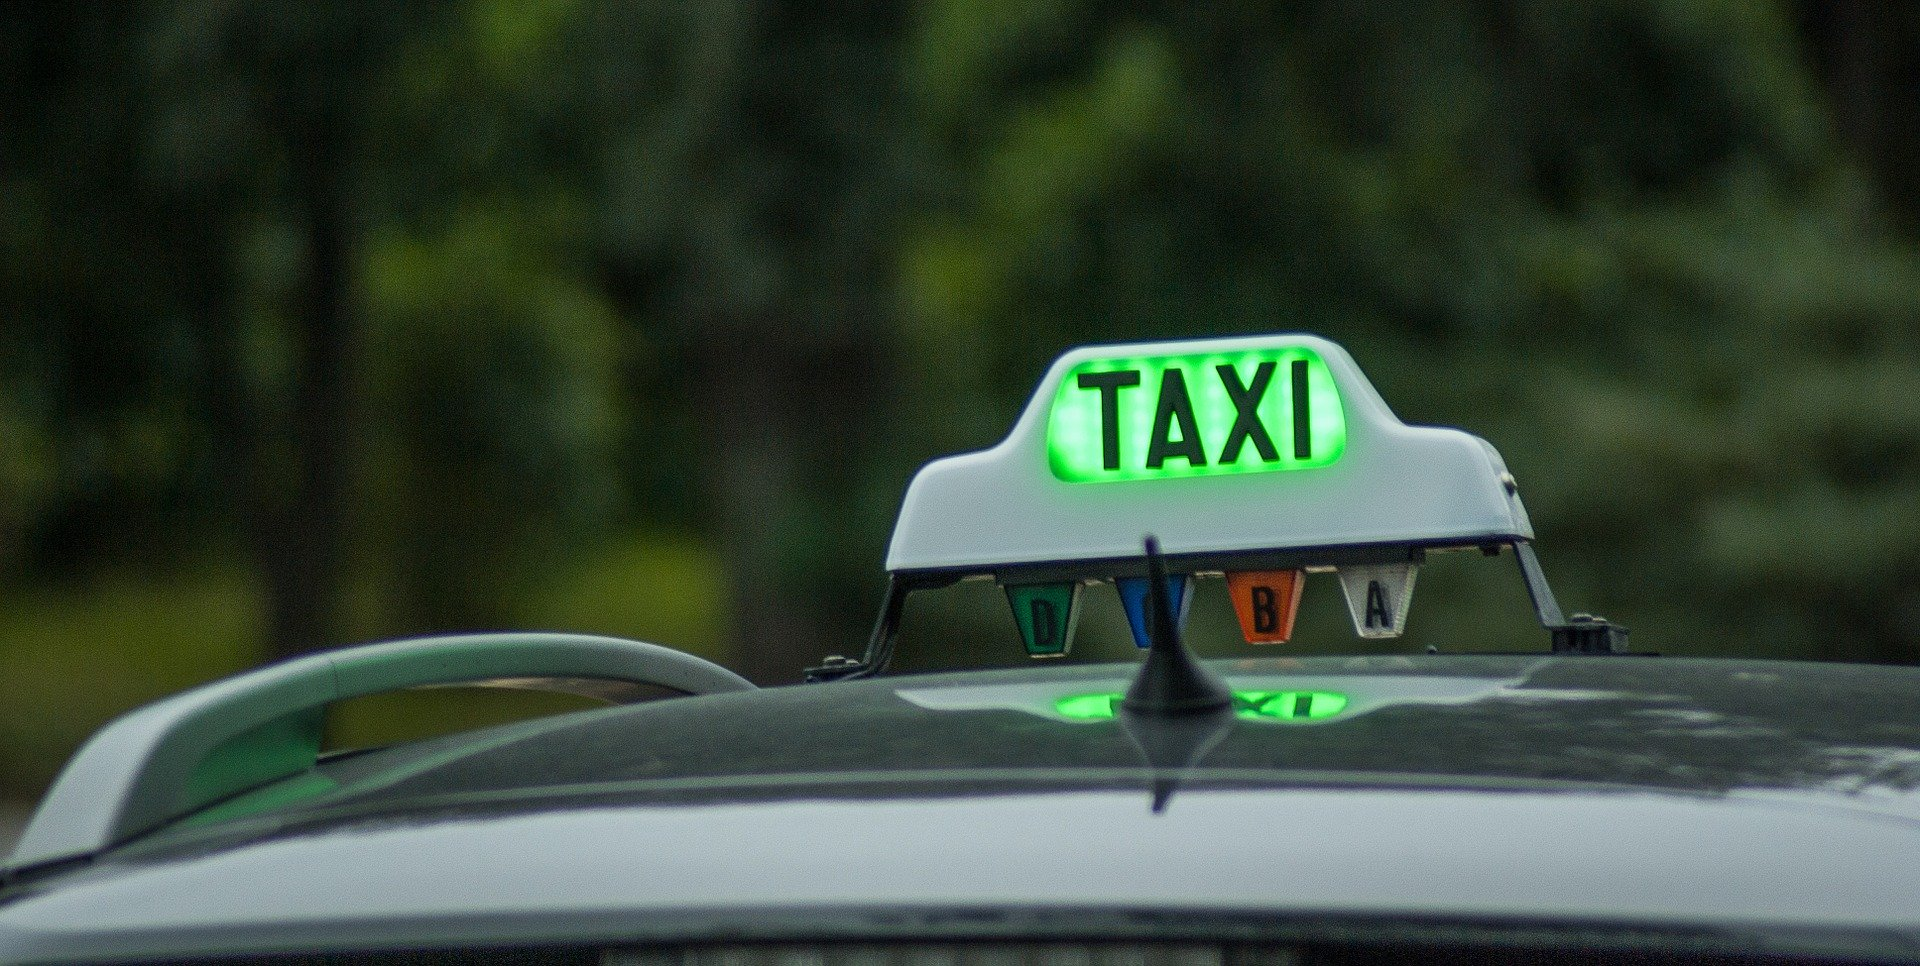 Taxi to Newport Bay Club